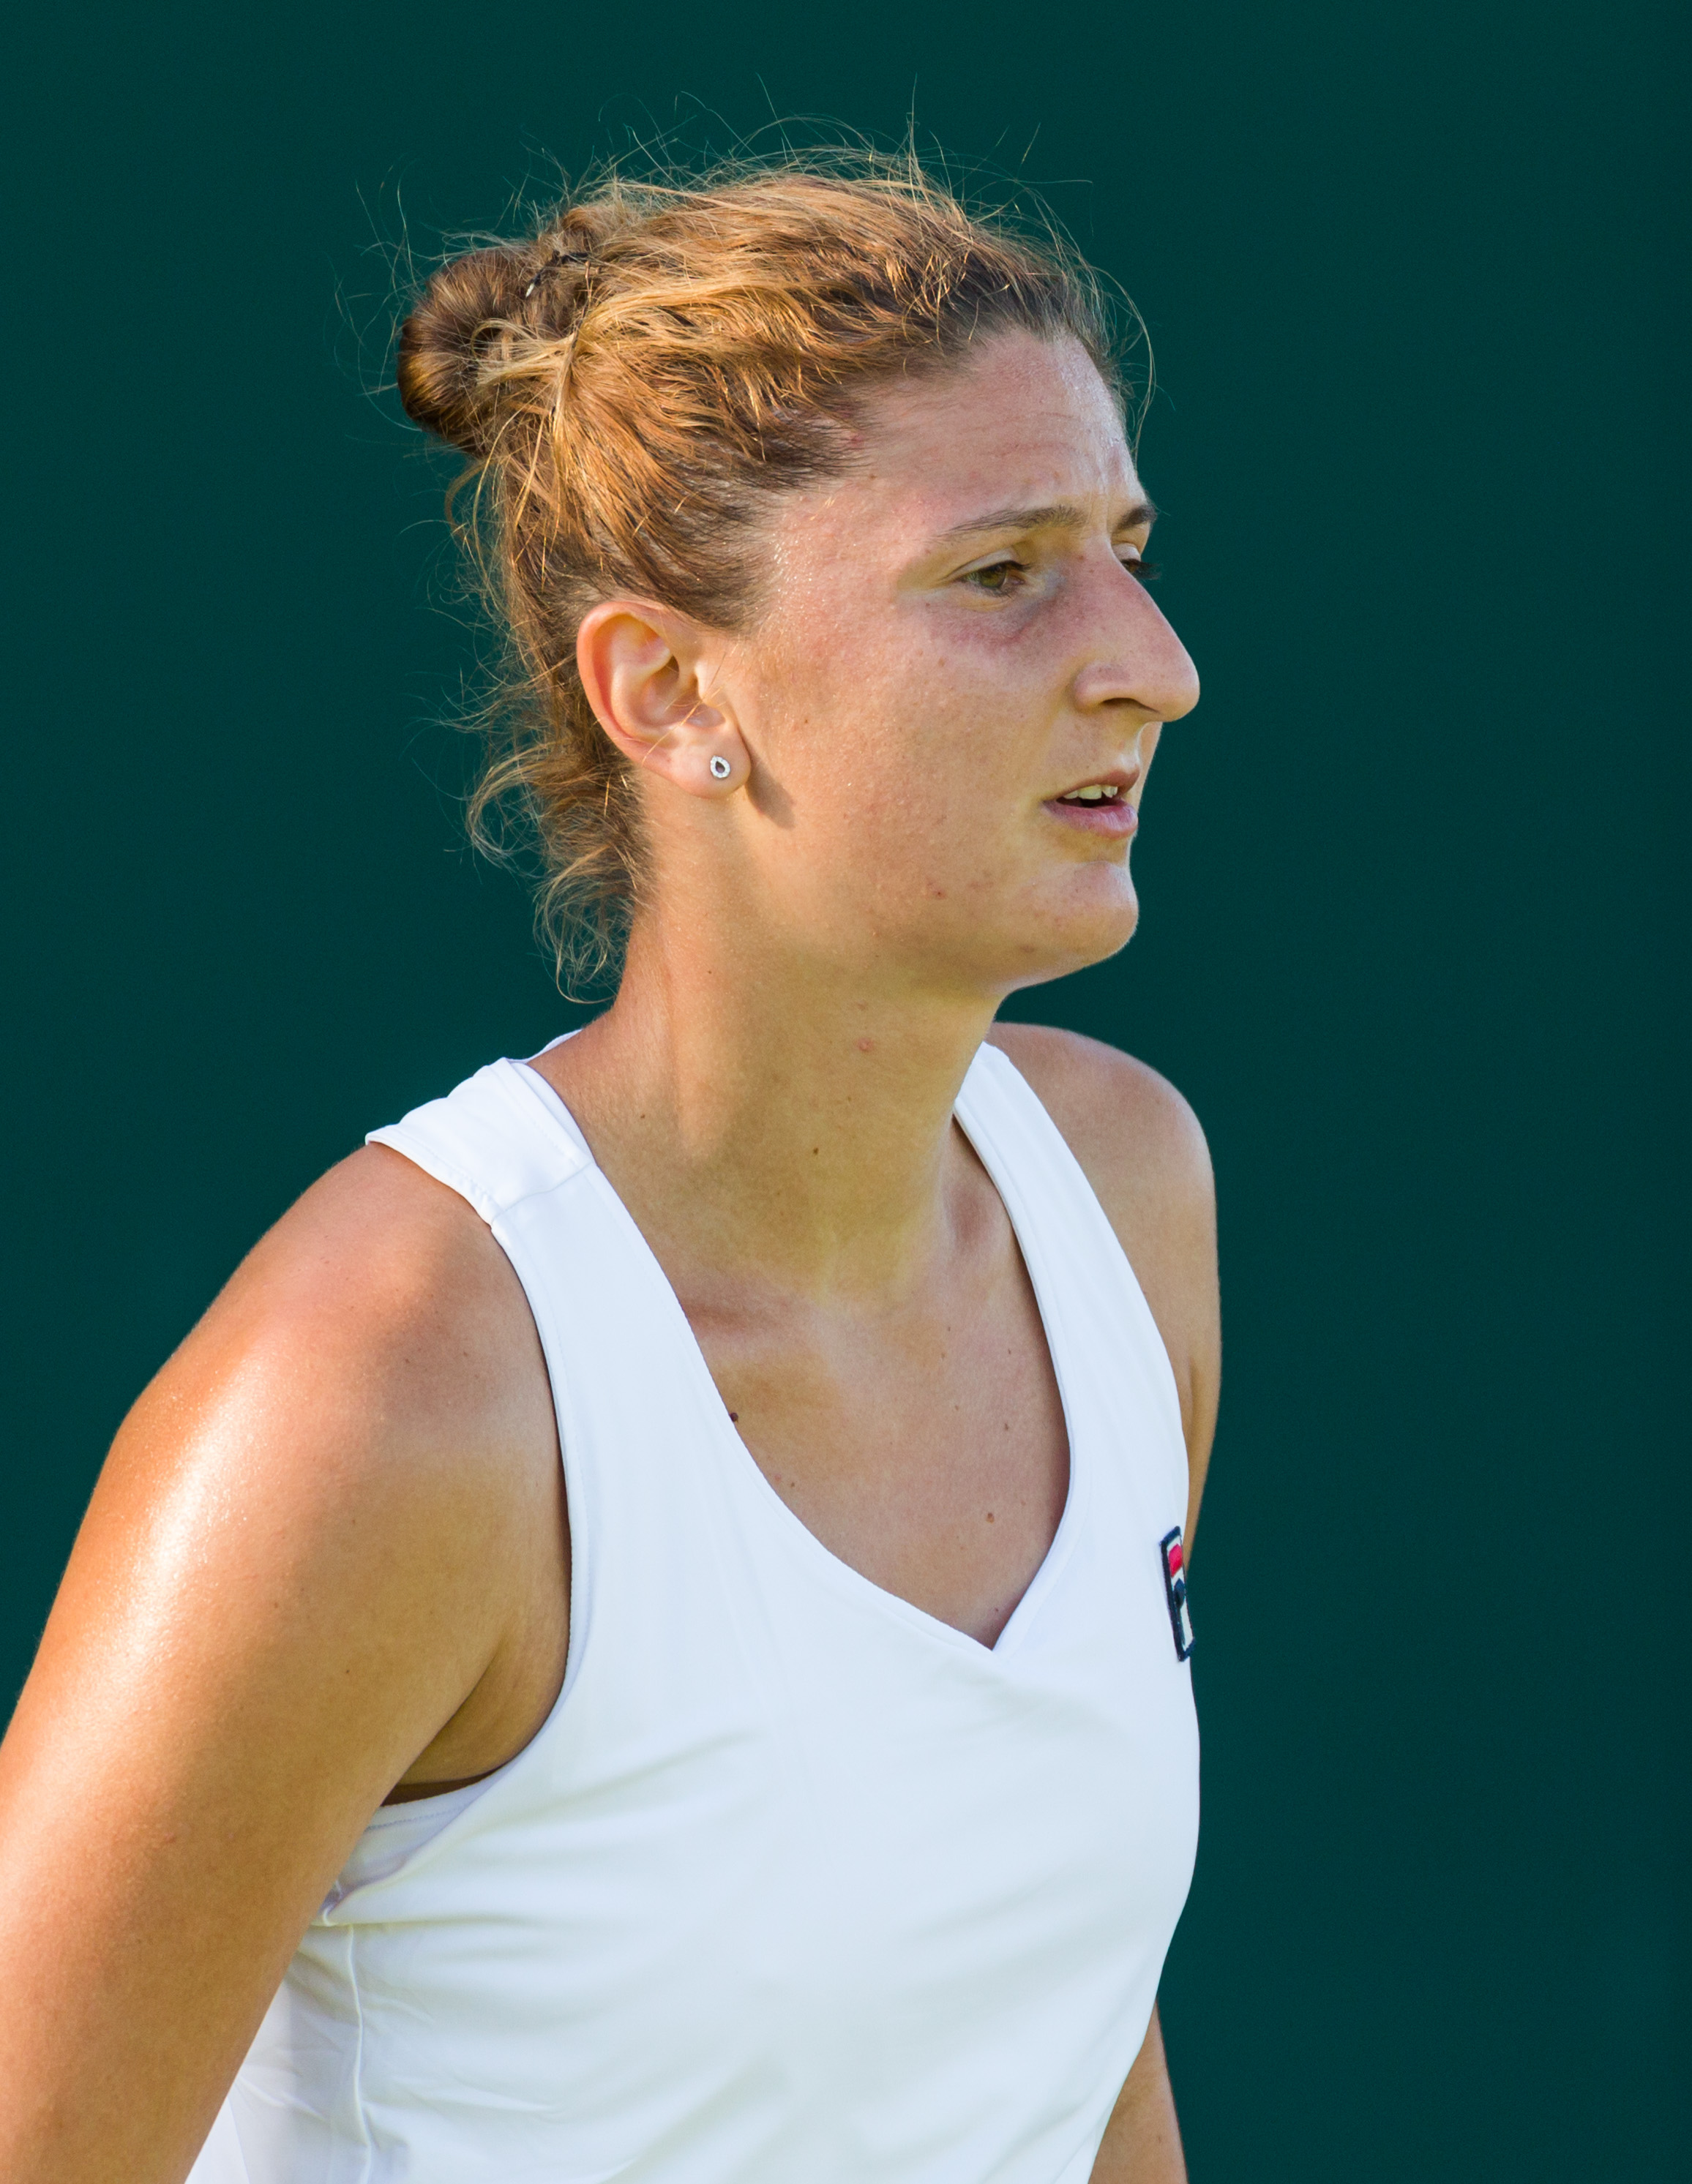 Simona Halep and Irina Begu reach the last 16 in Roland Garros  |Irina Begu